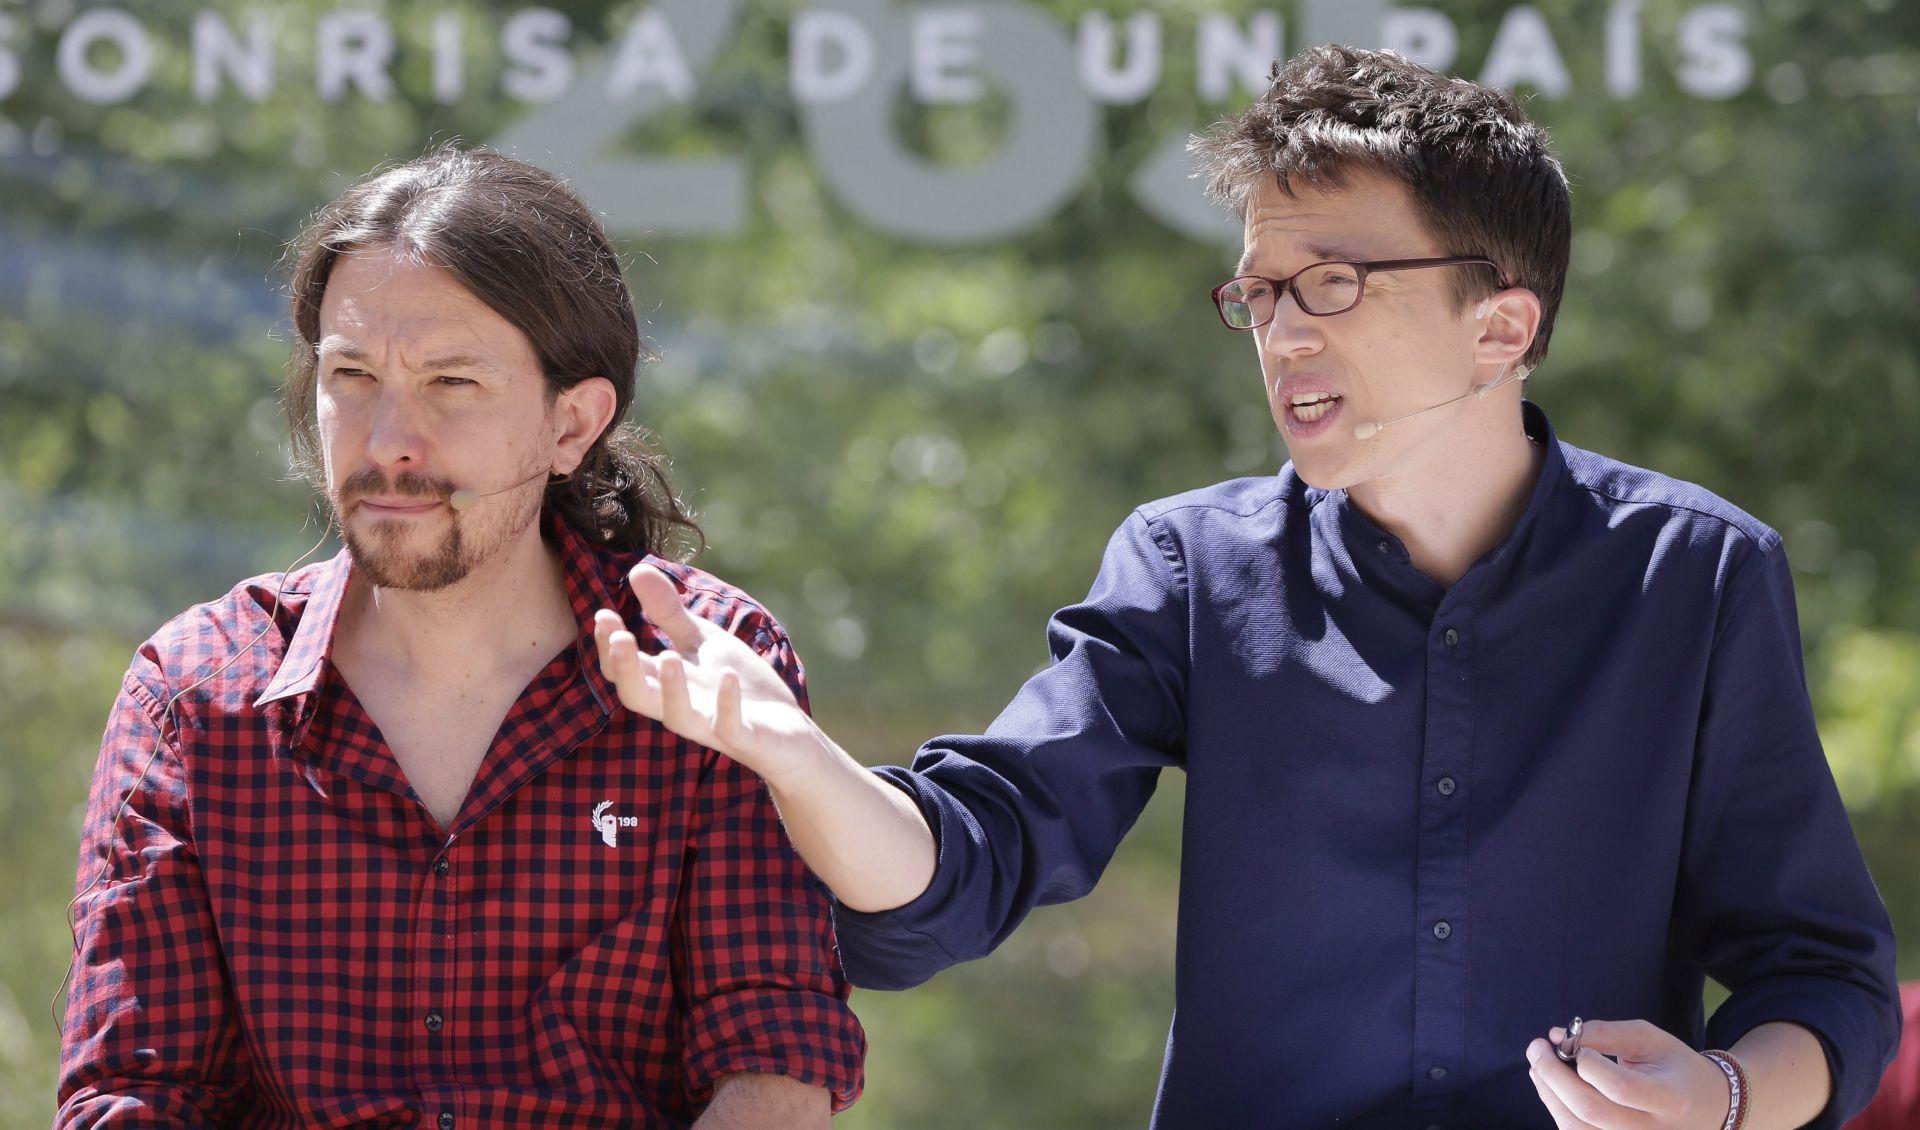 Španjolska pred izbore: 'Radikalna' ljevica najveći konkurent Narodnoj stranci